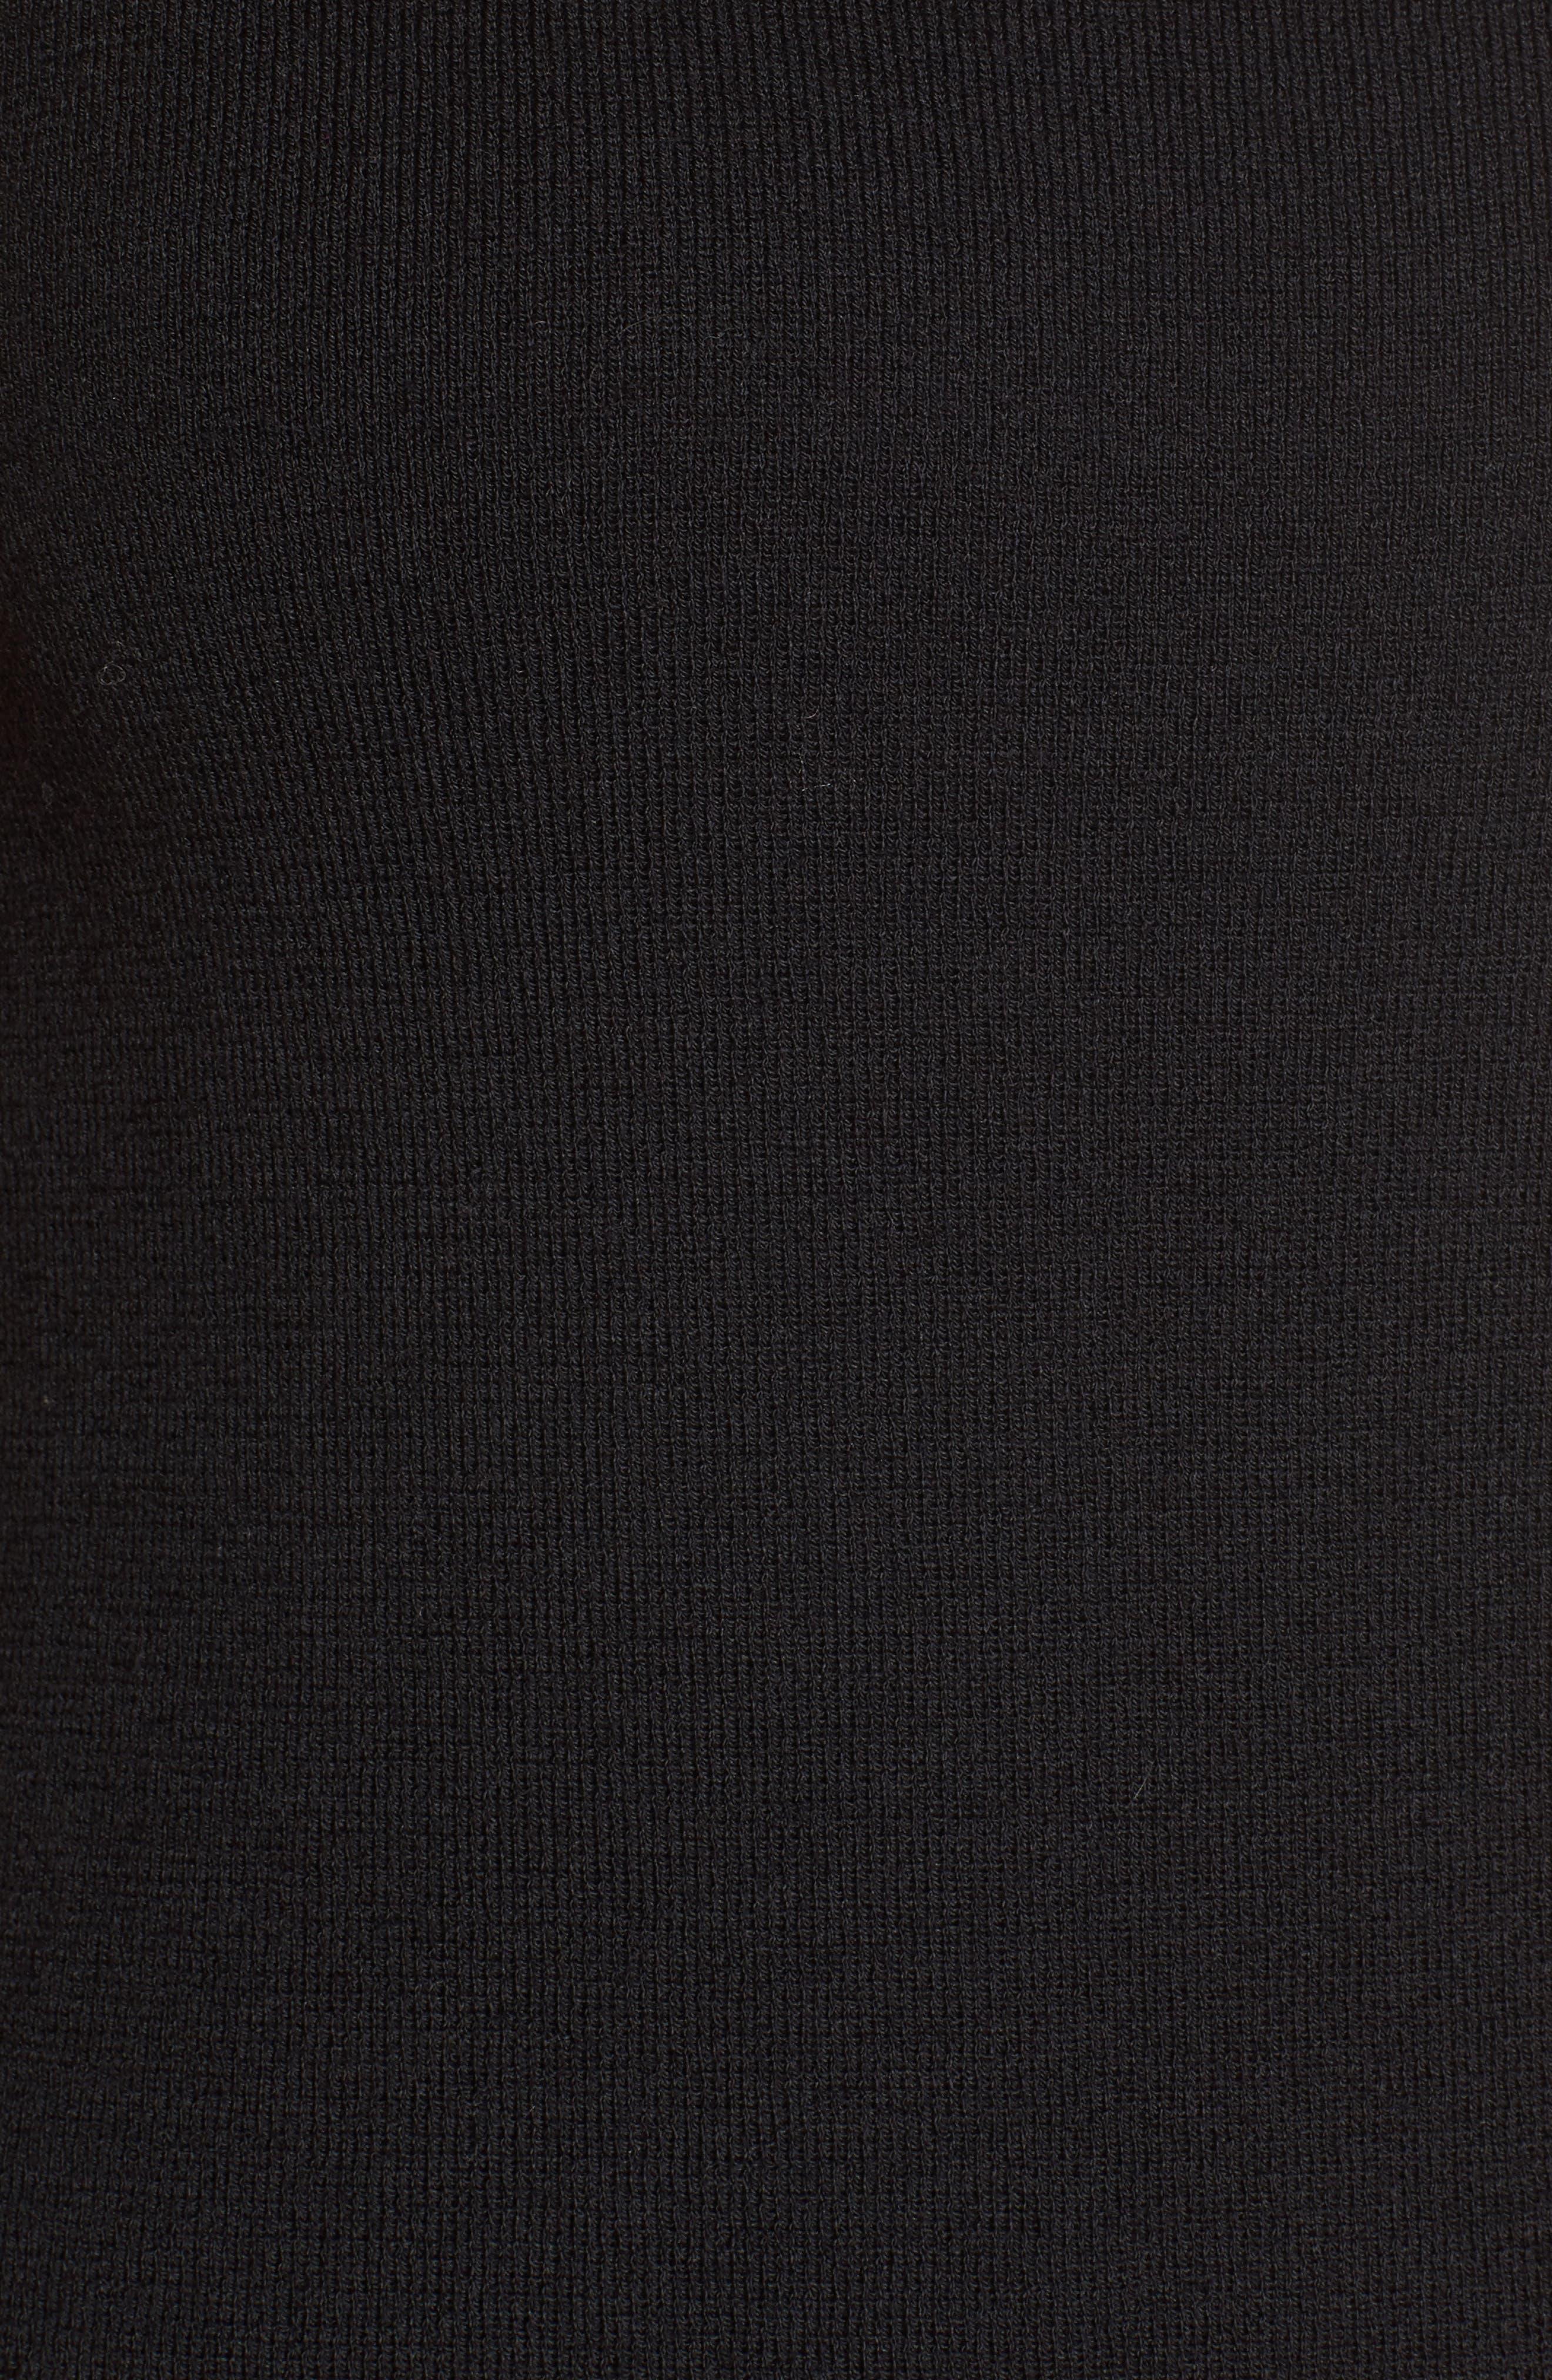 Wool Knit Tunic,                             Alternate thumbnail 5, color,                             001